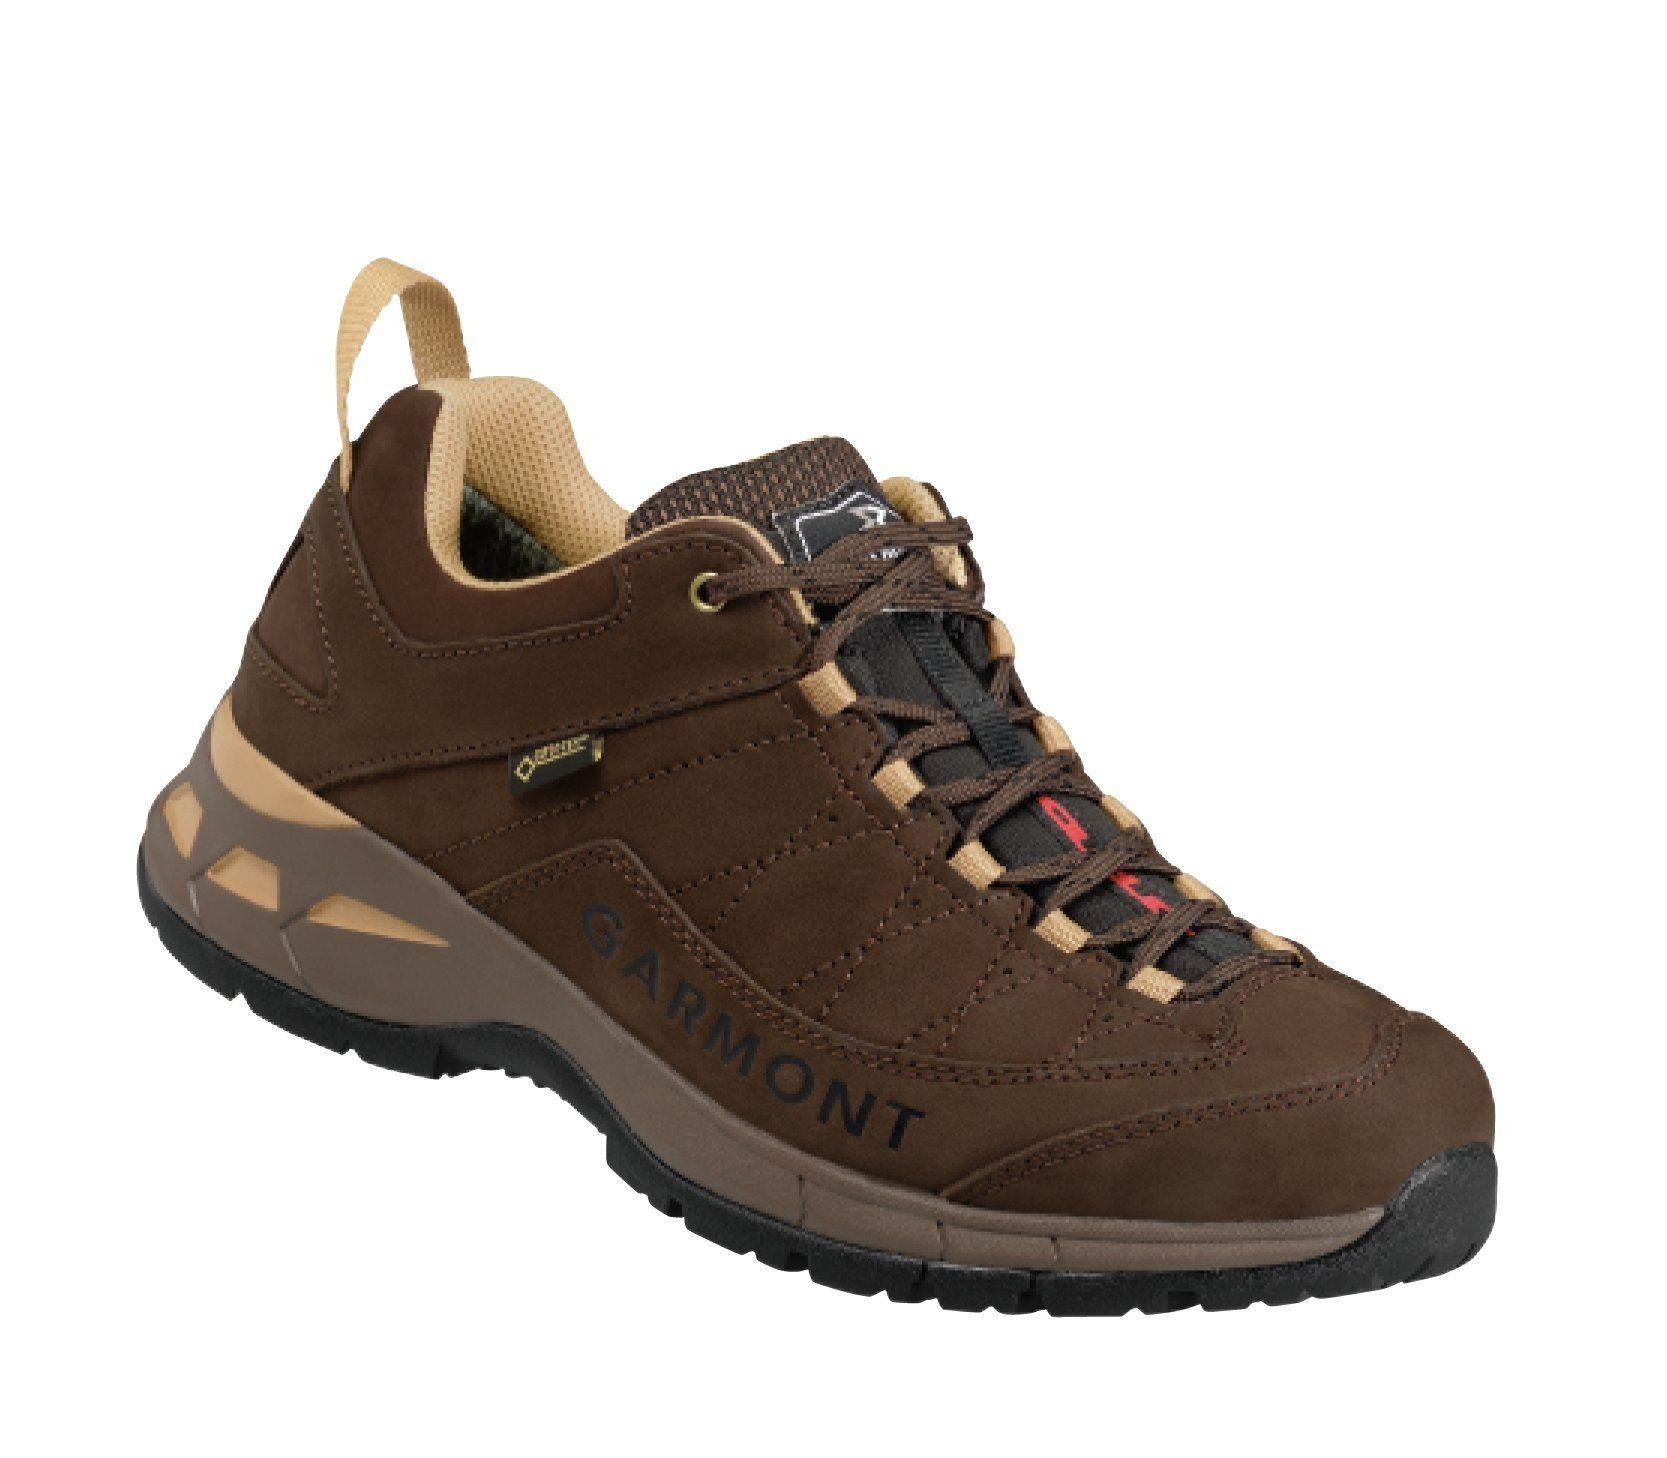 Garmont Kletterschuh »Trail Beast GTX Shoes Women«